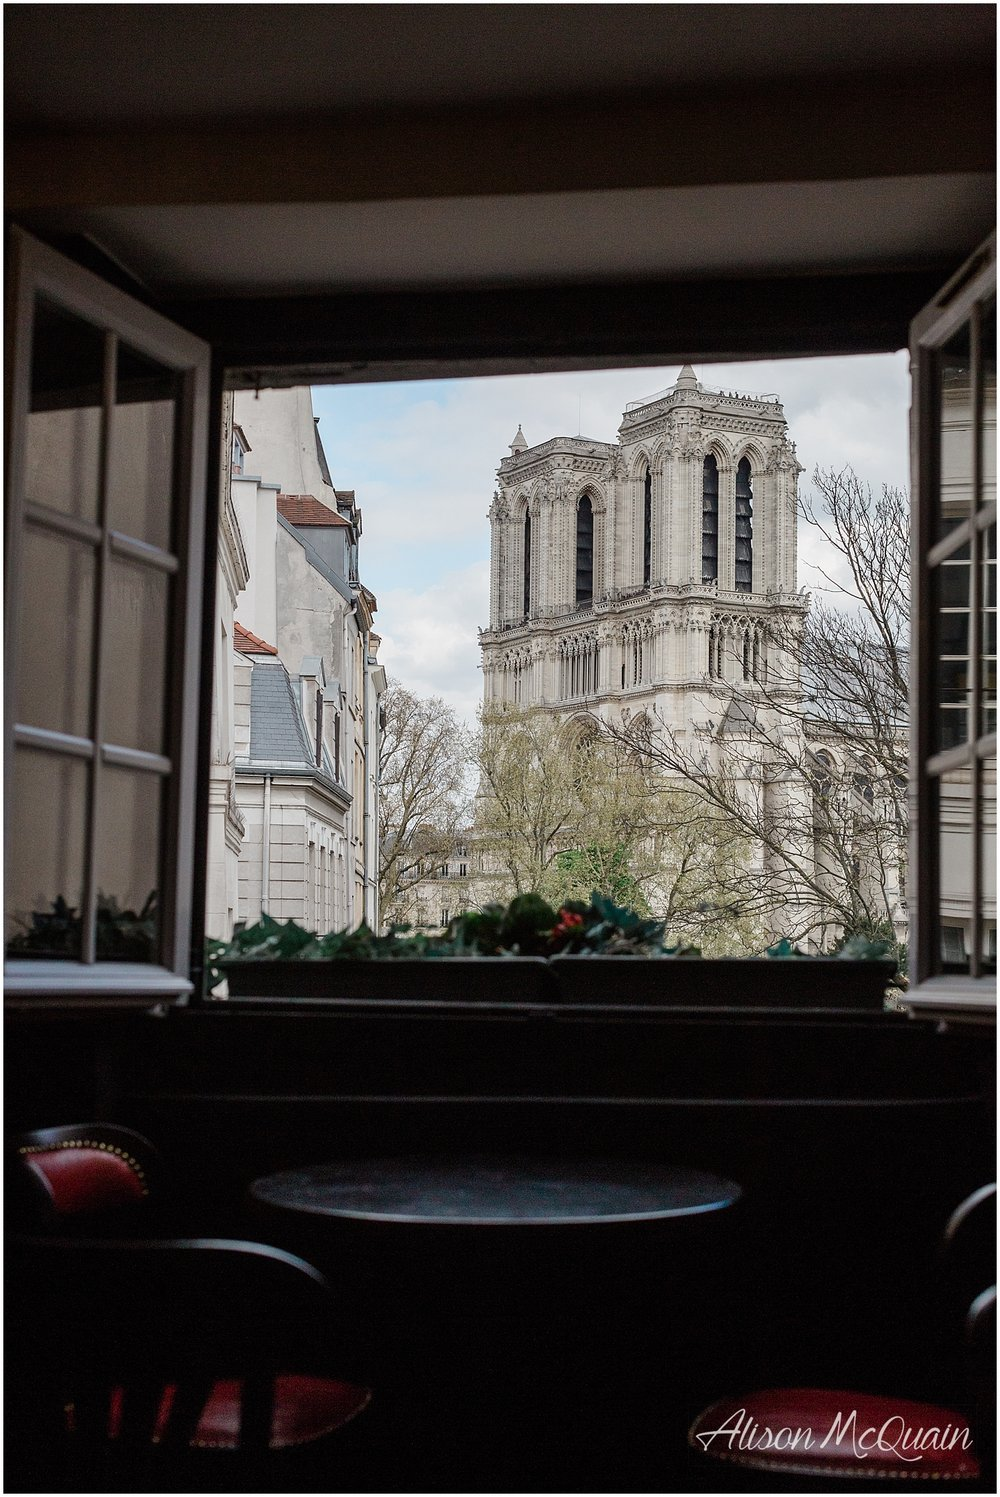 France_Paris_Marseille_Cassis_alisonmcquainphtography2018-04-27_0027.jpg